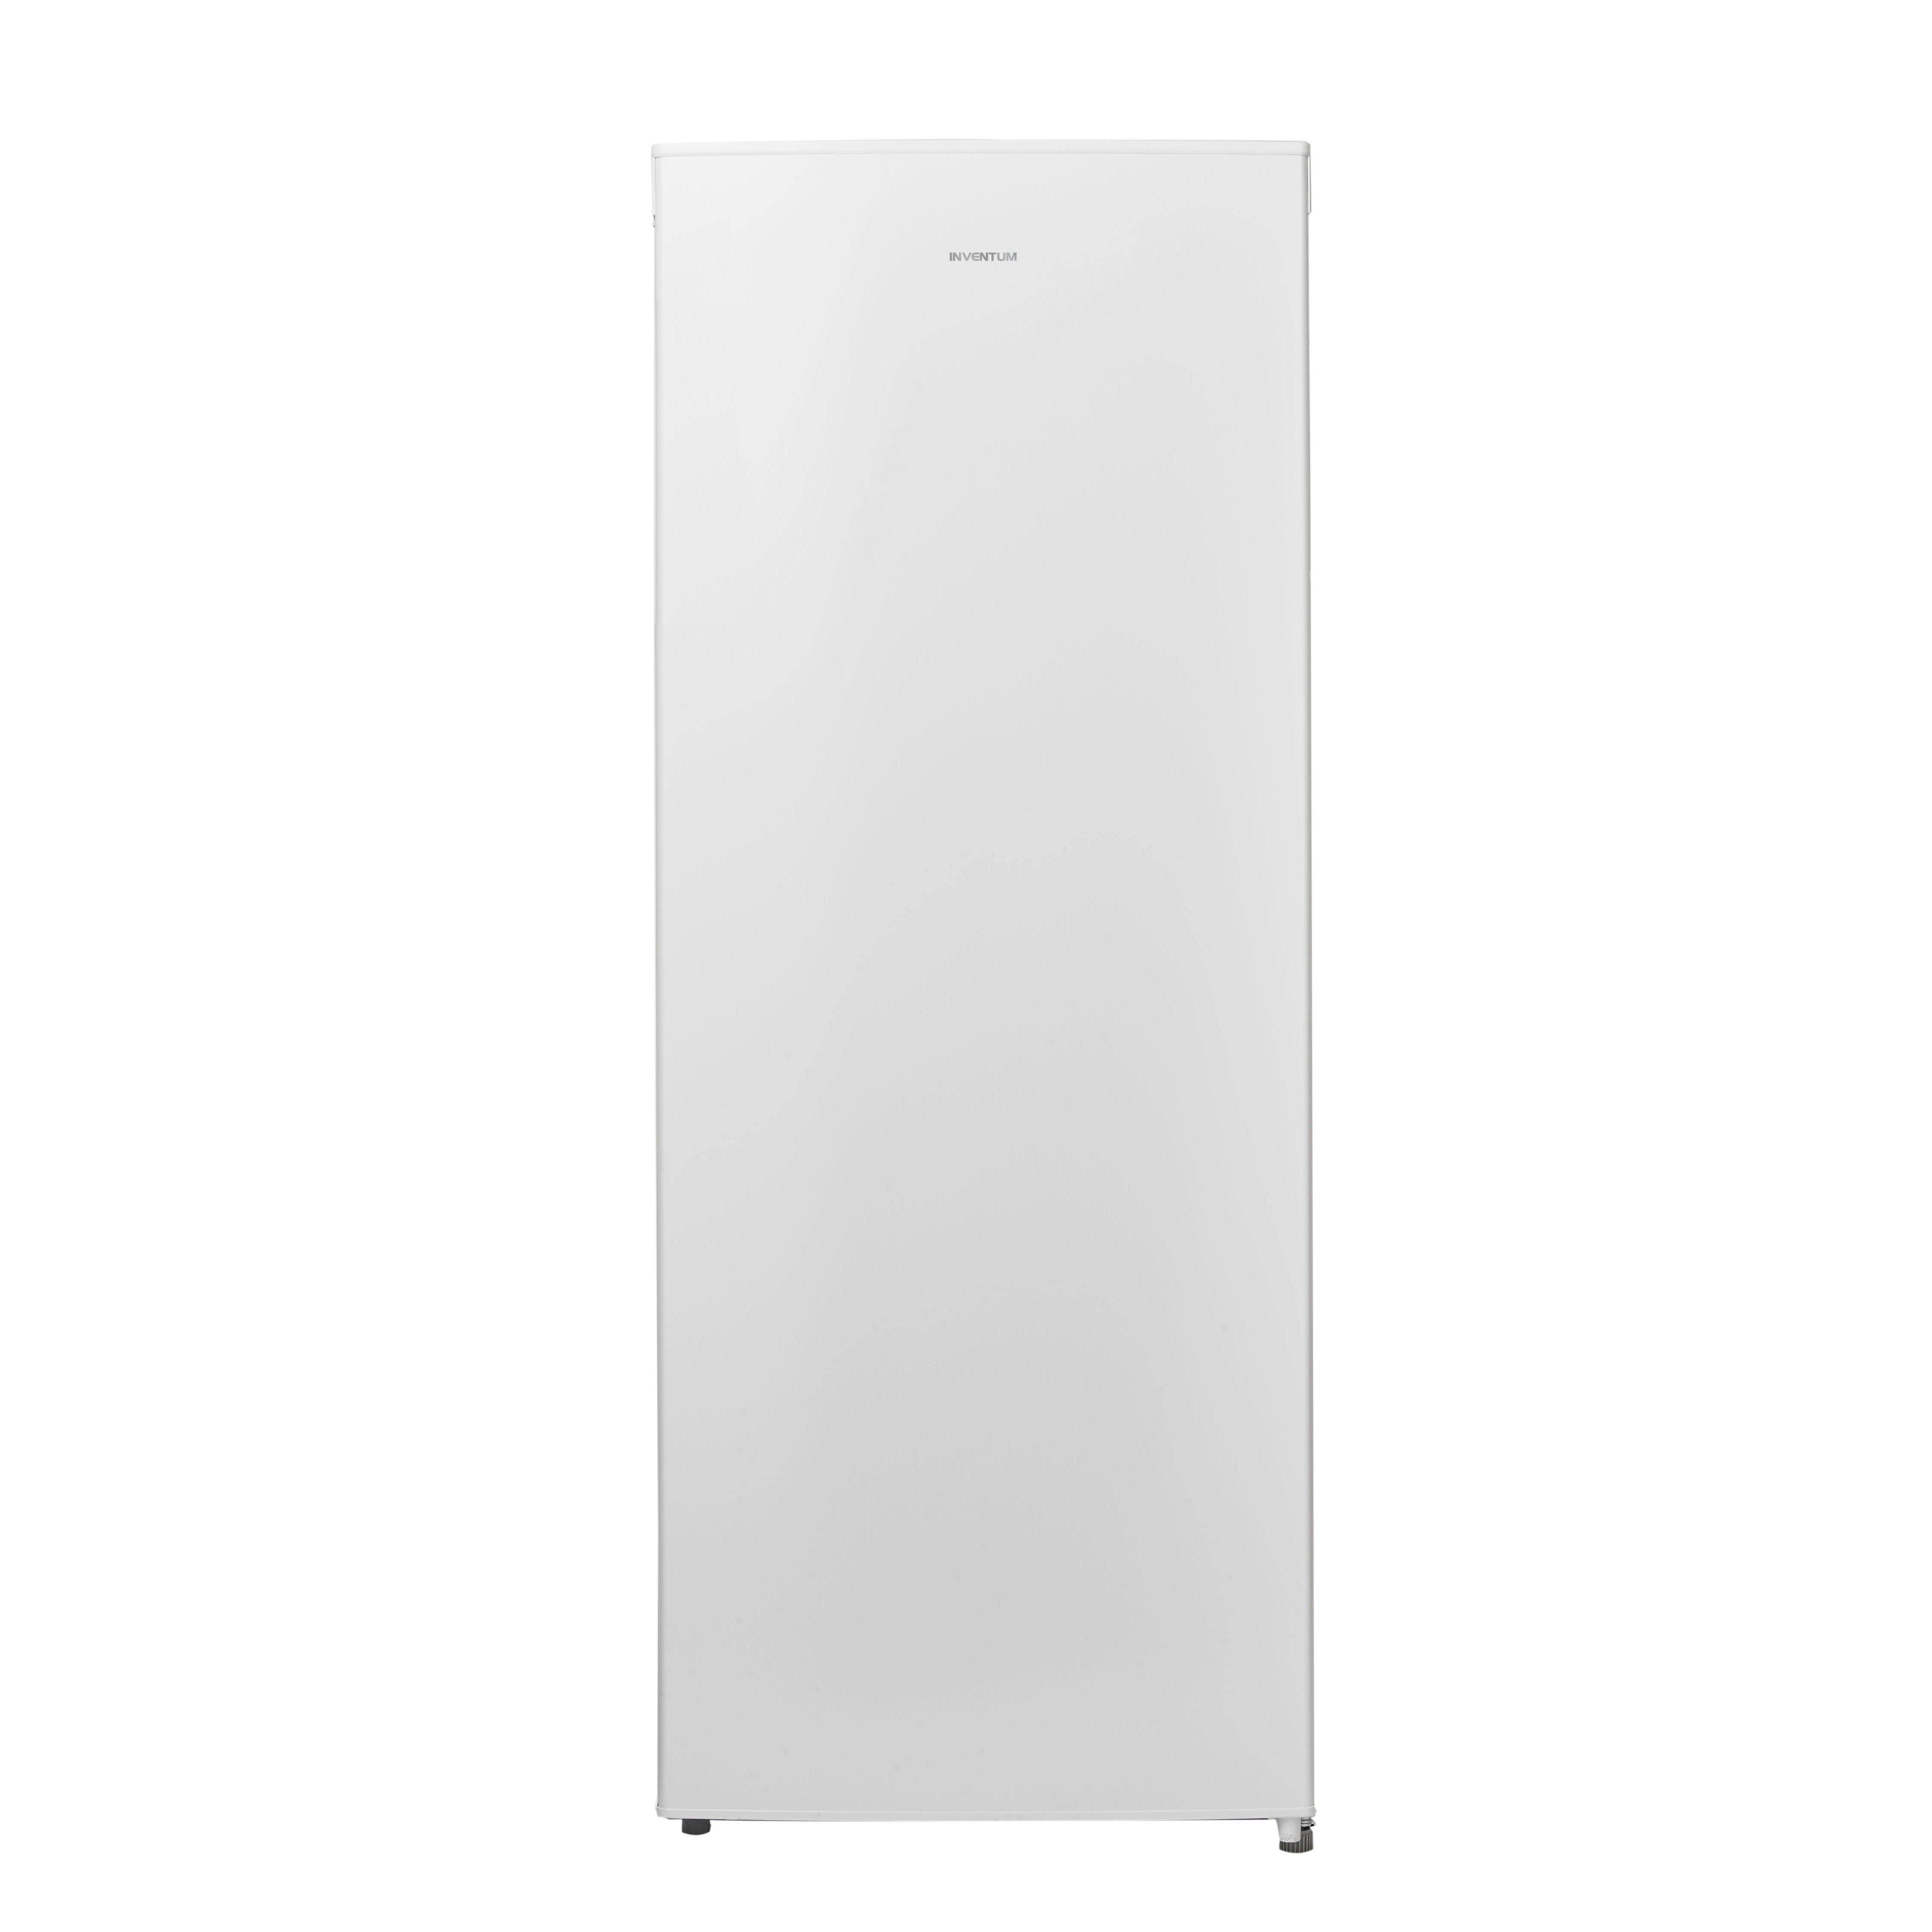 Inventum KK1420 koelkast zonder vriesvak